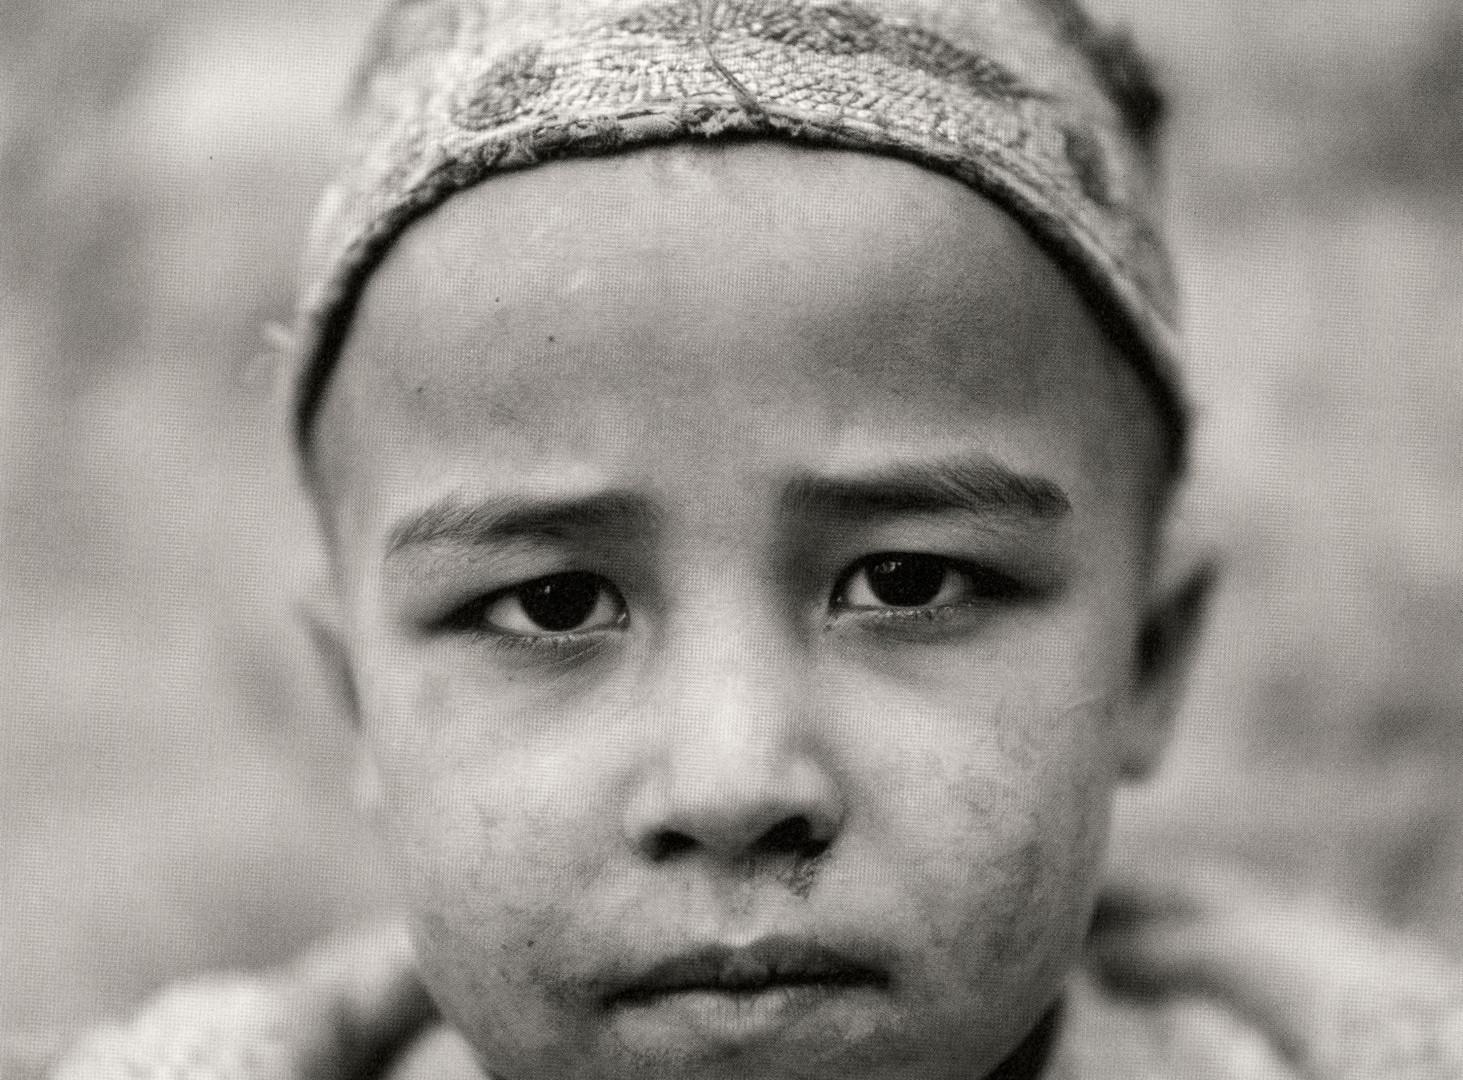 Fazal Sheikh, Afghan child born in exile, Afghan Refugee Village, Khairabad, Northern Pakistan, 1997